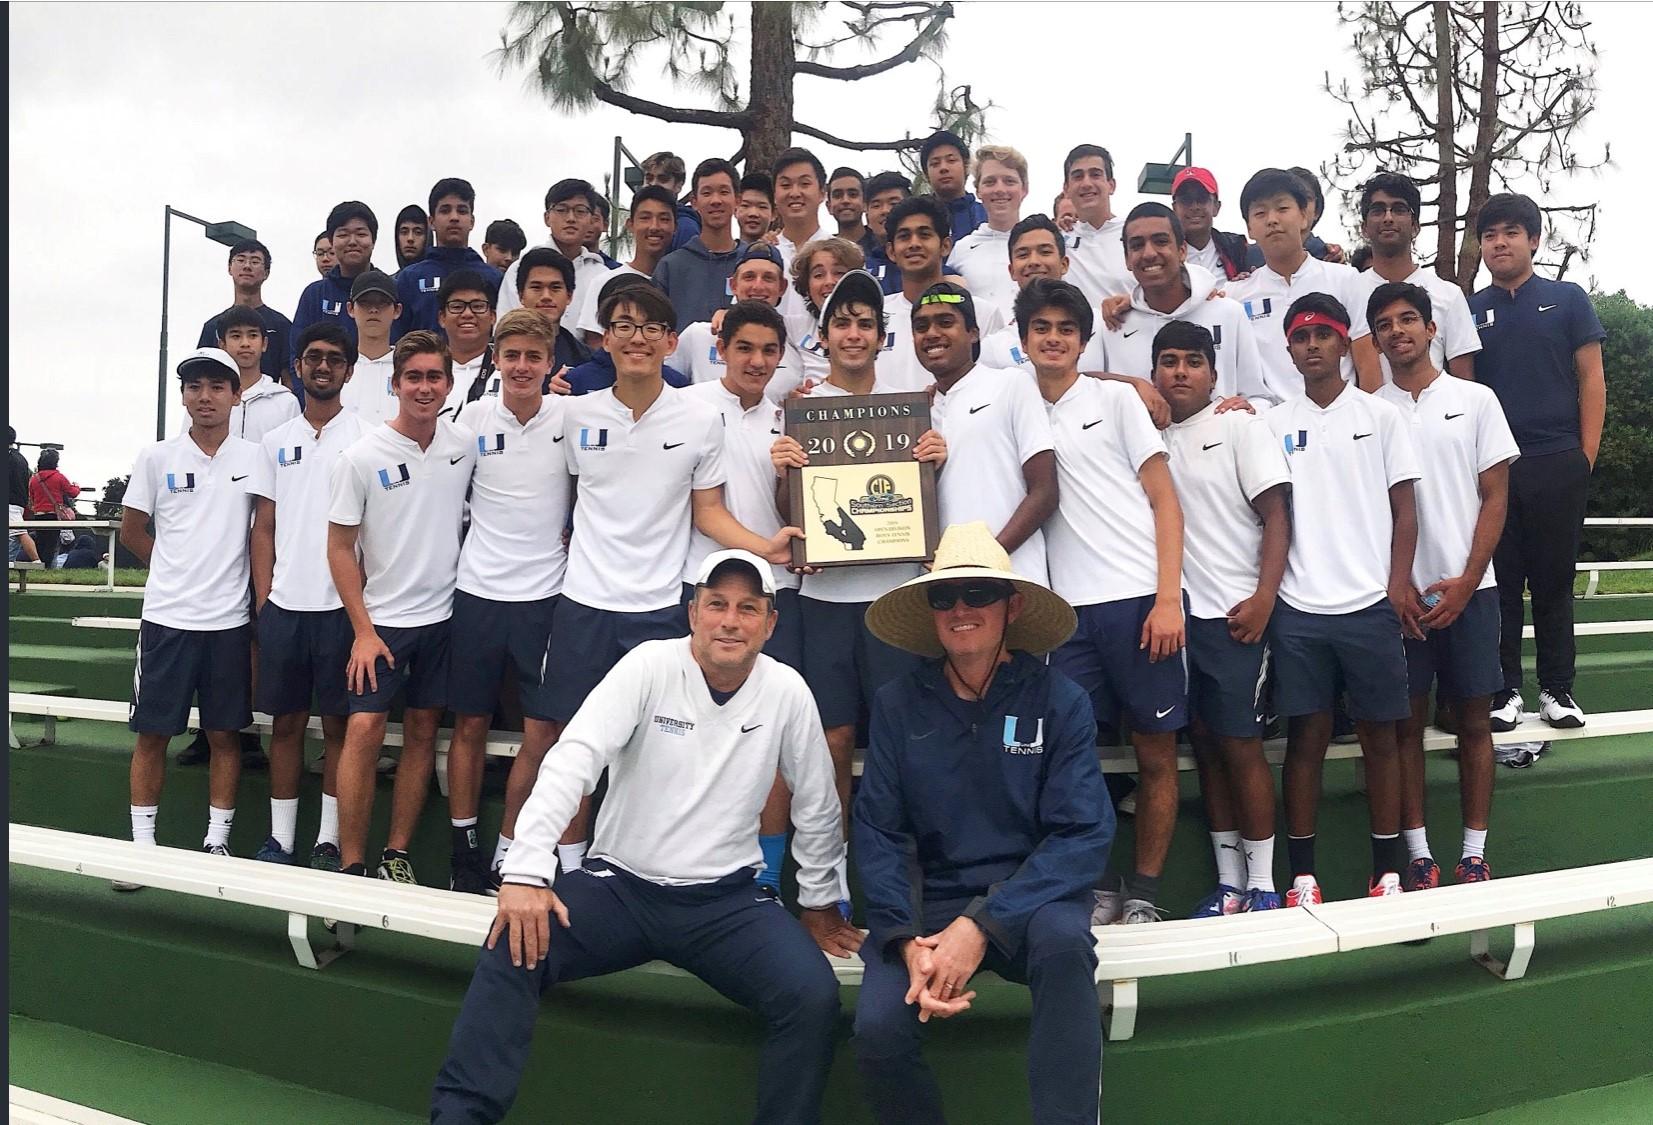 Boys Tennis CIF Champs